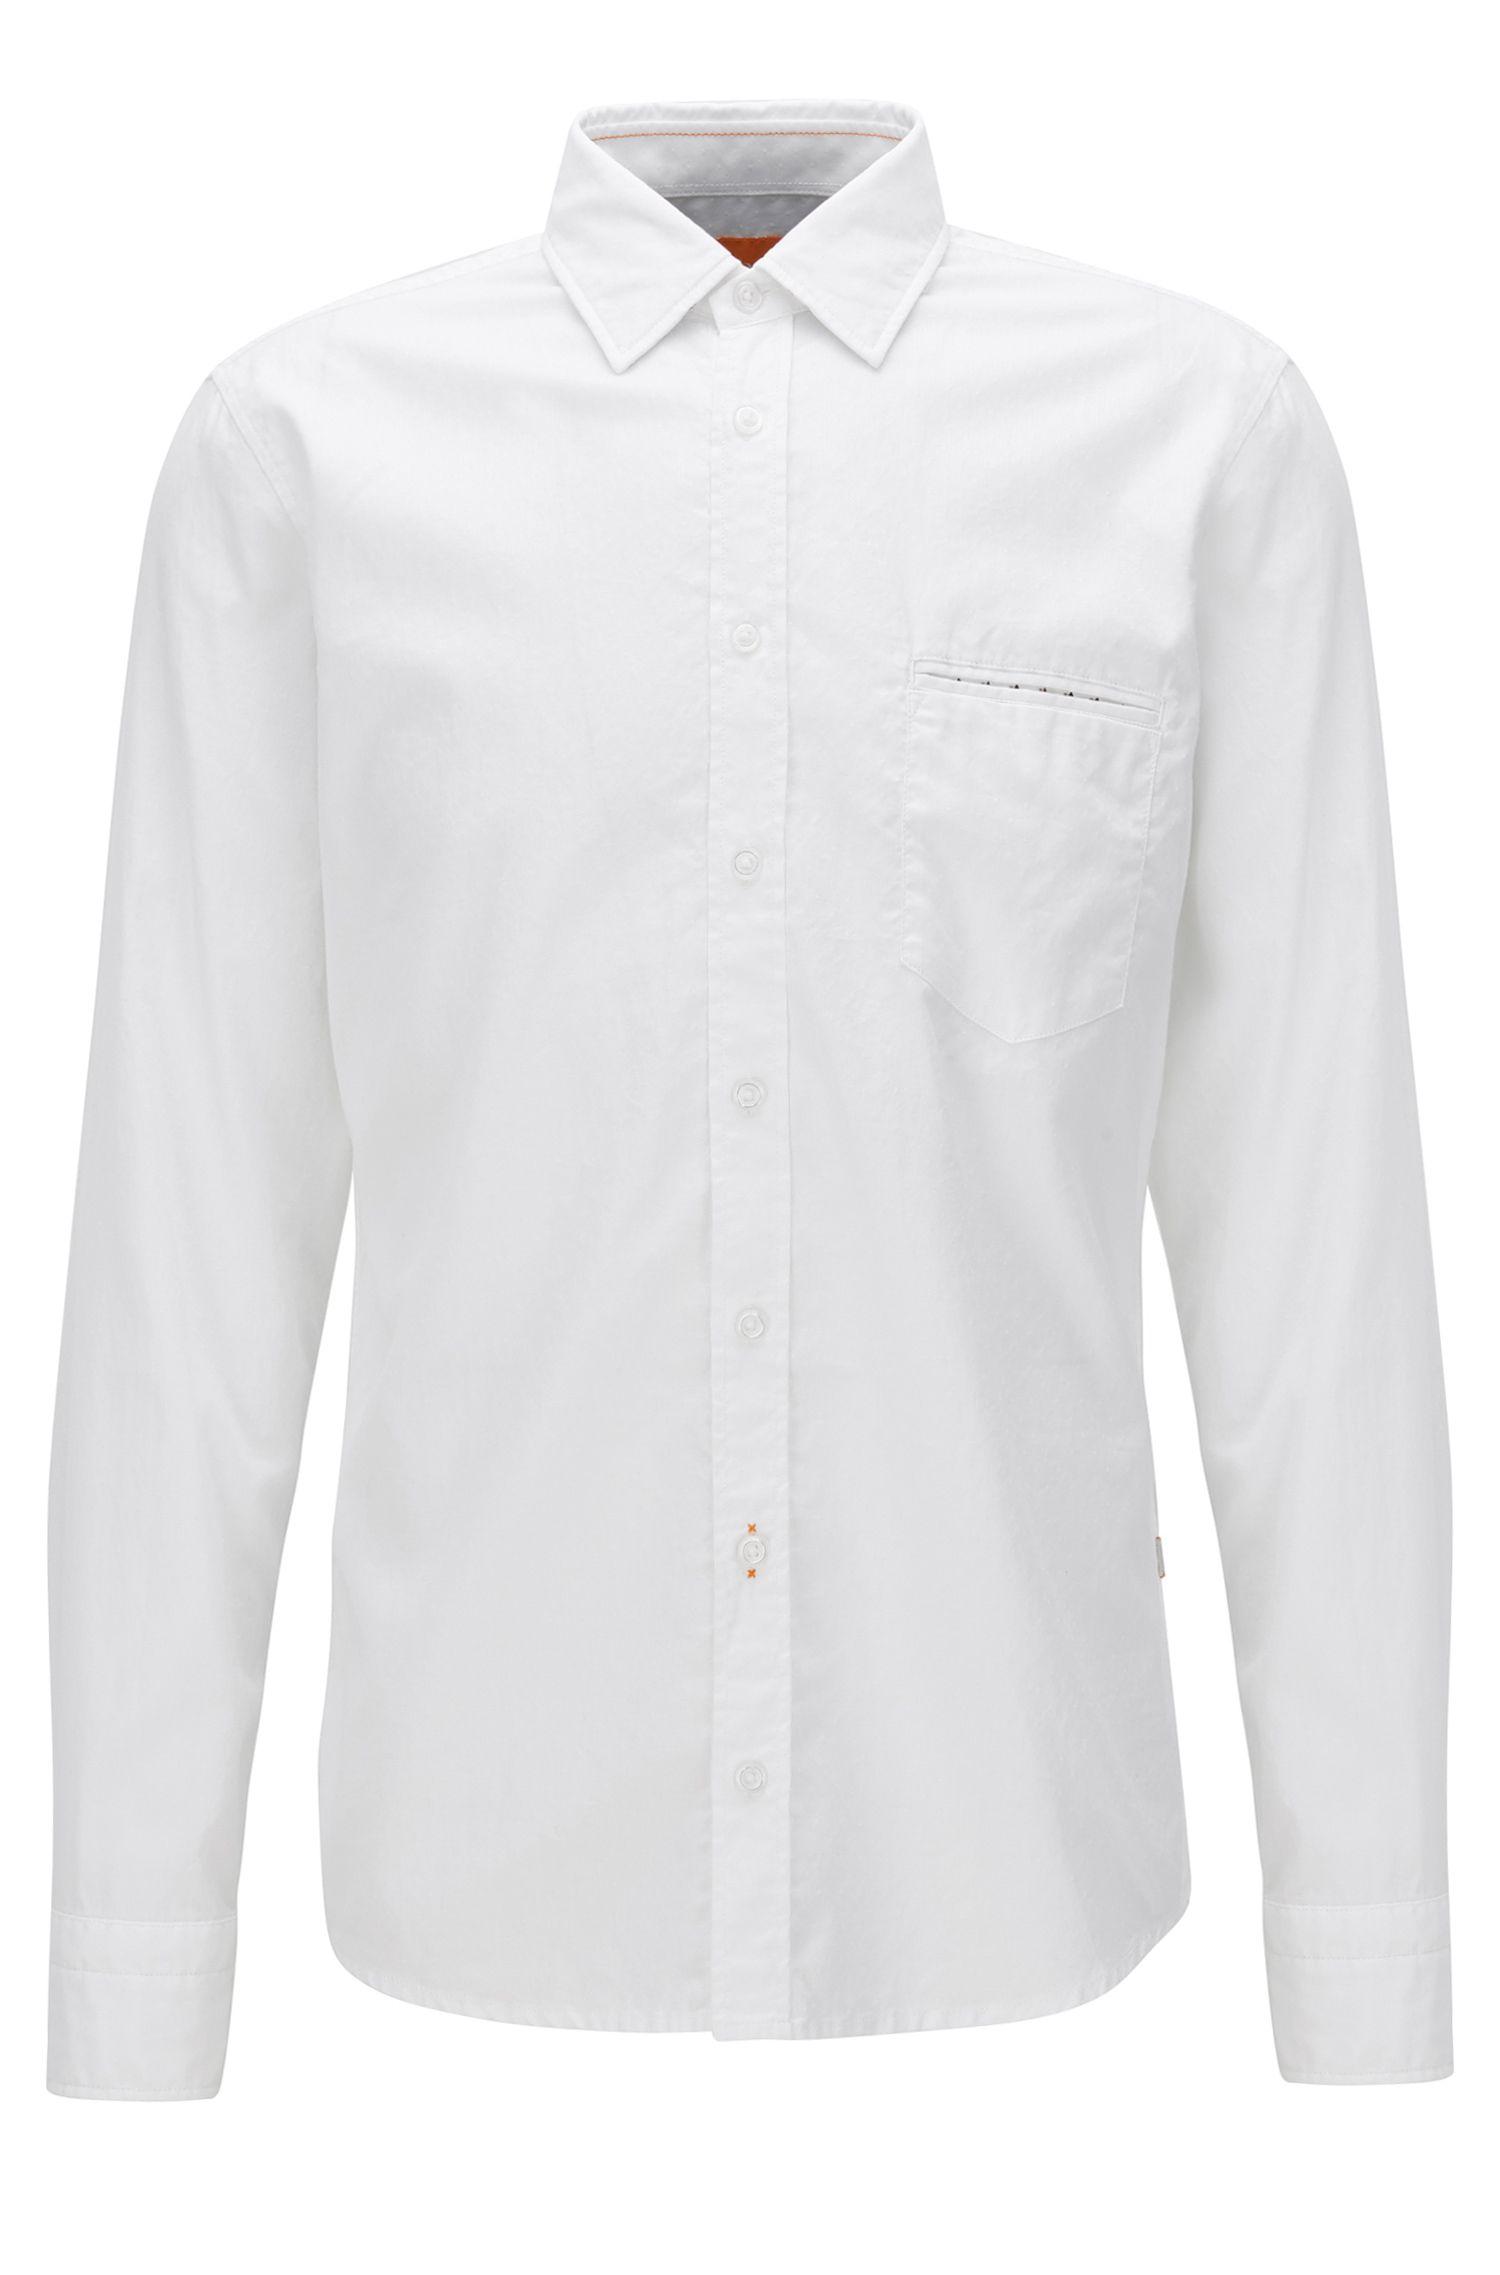 Camisa regular fit en algodón de tejido dobby